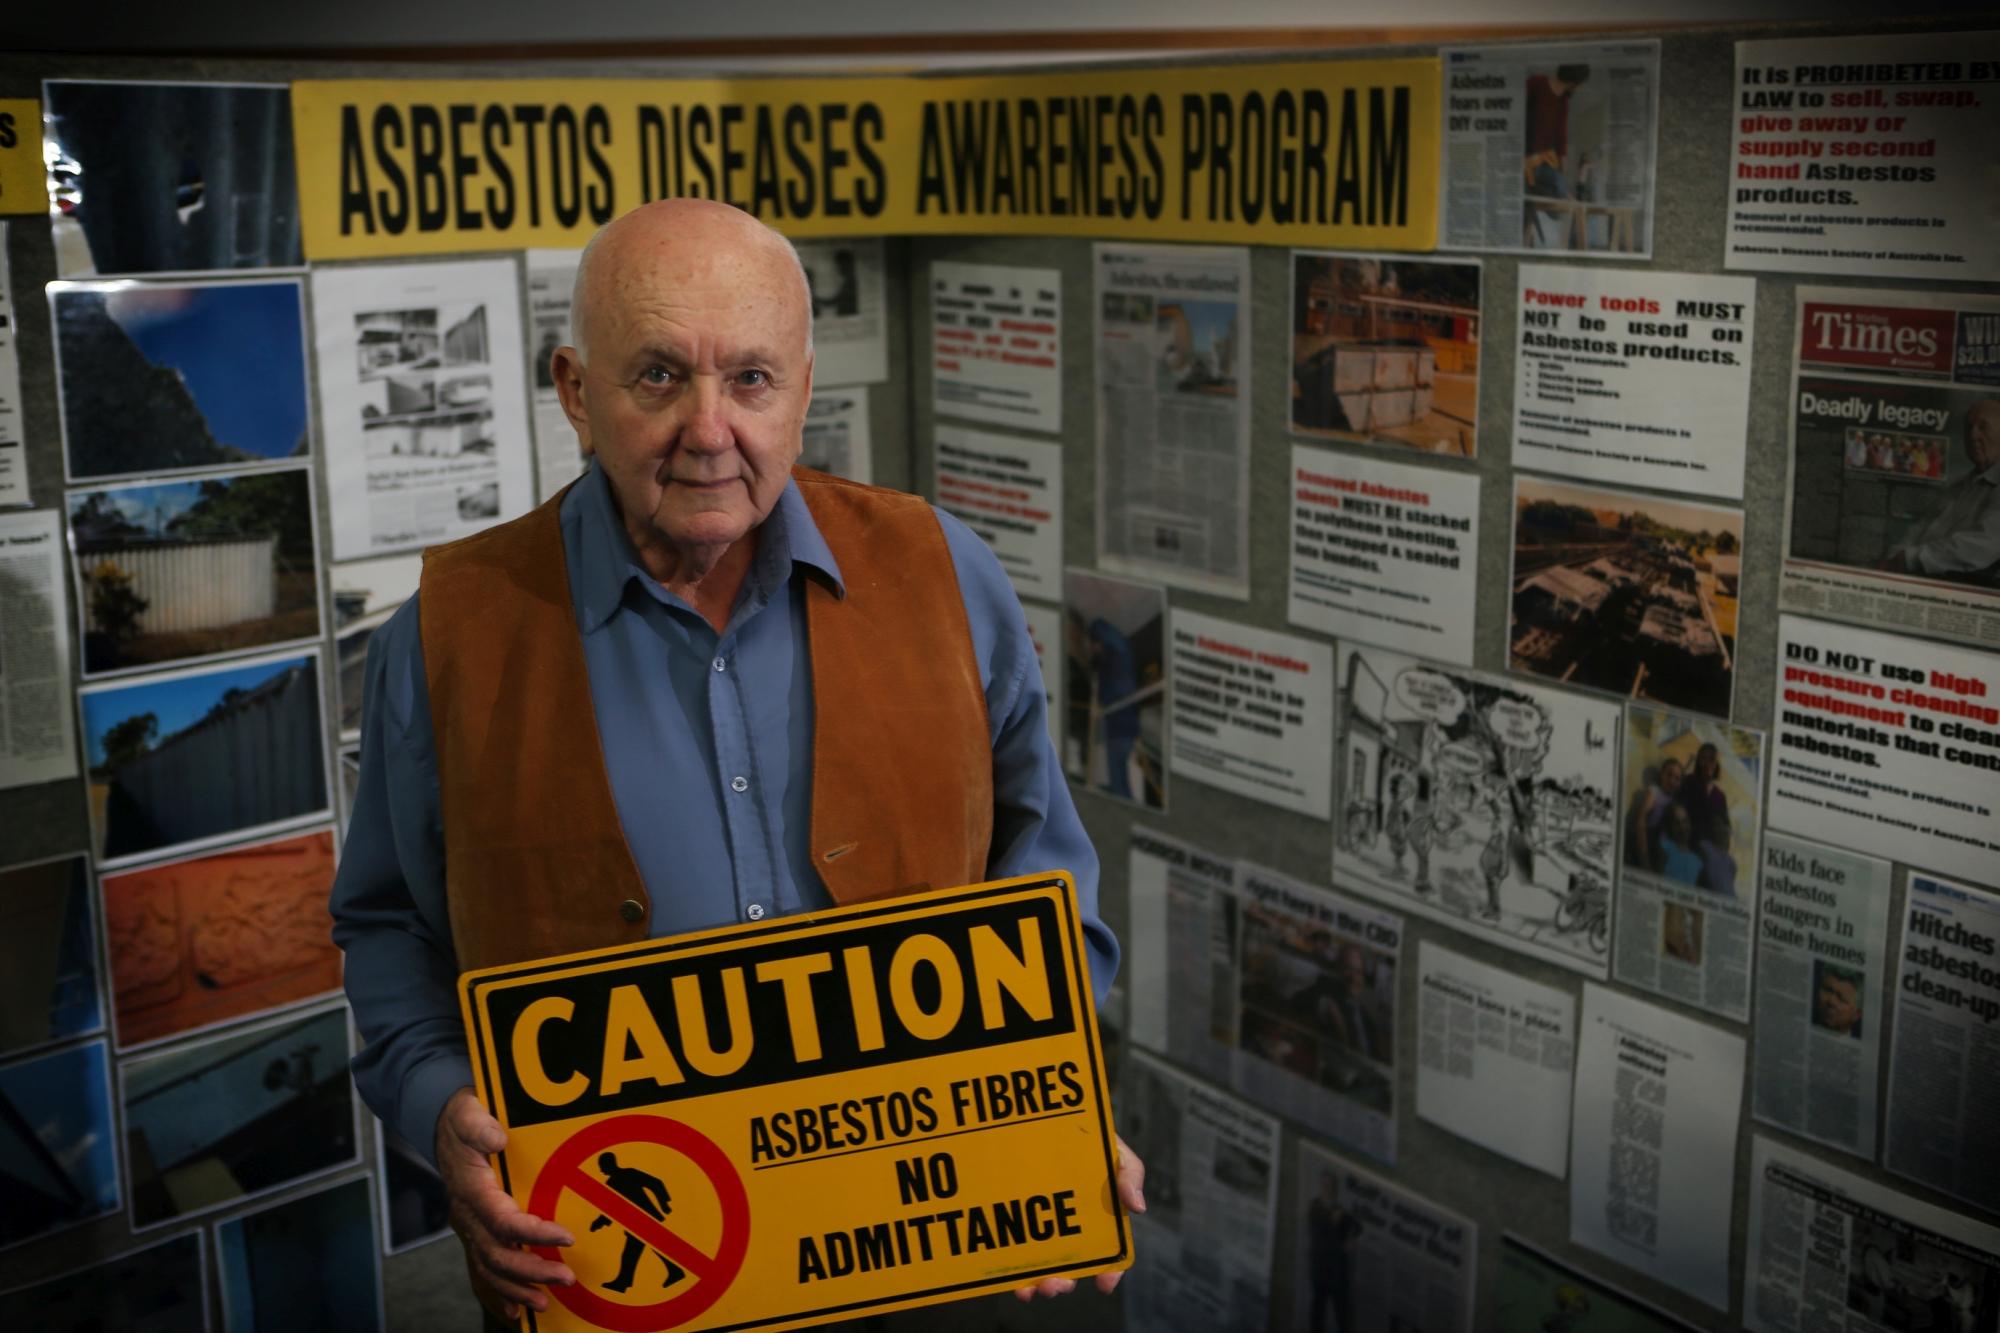 Asbestos Diseases Society of Australia president Robert Vojakovic.